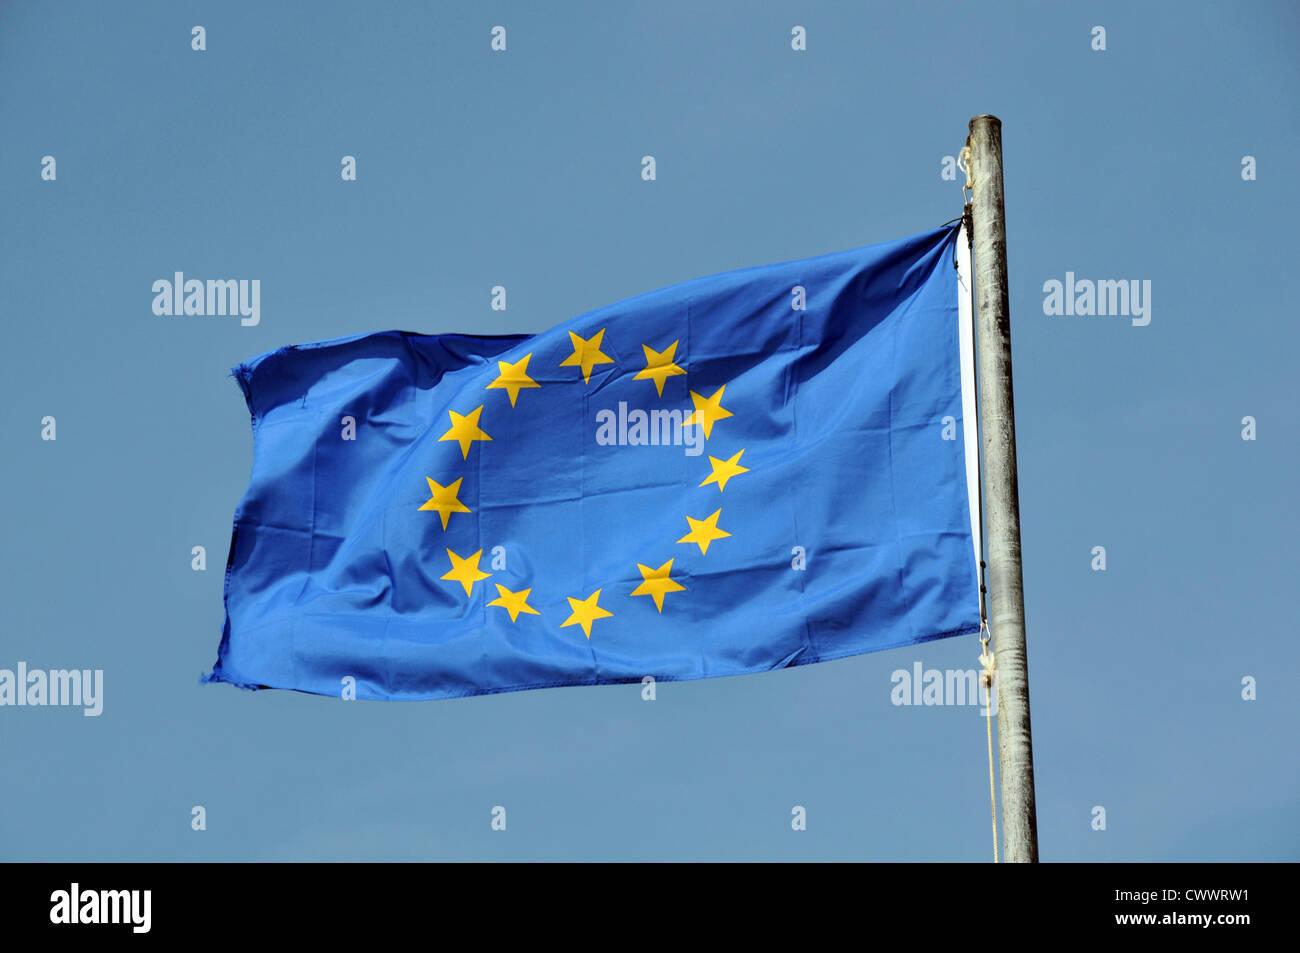 EEC flag in blue sky - Stock Image